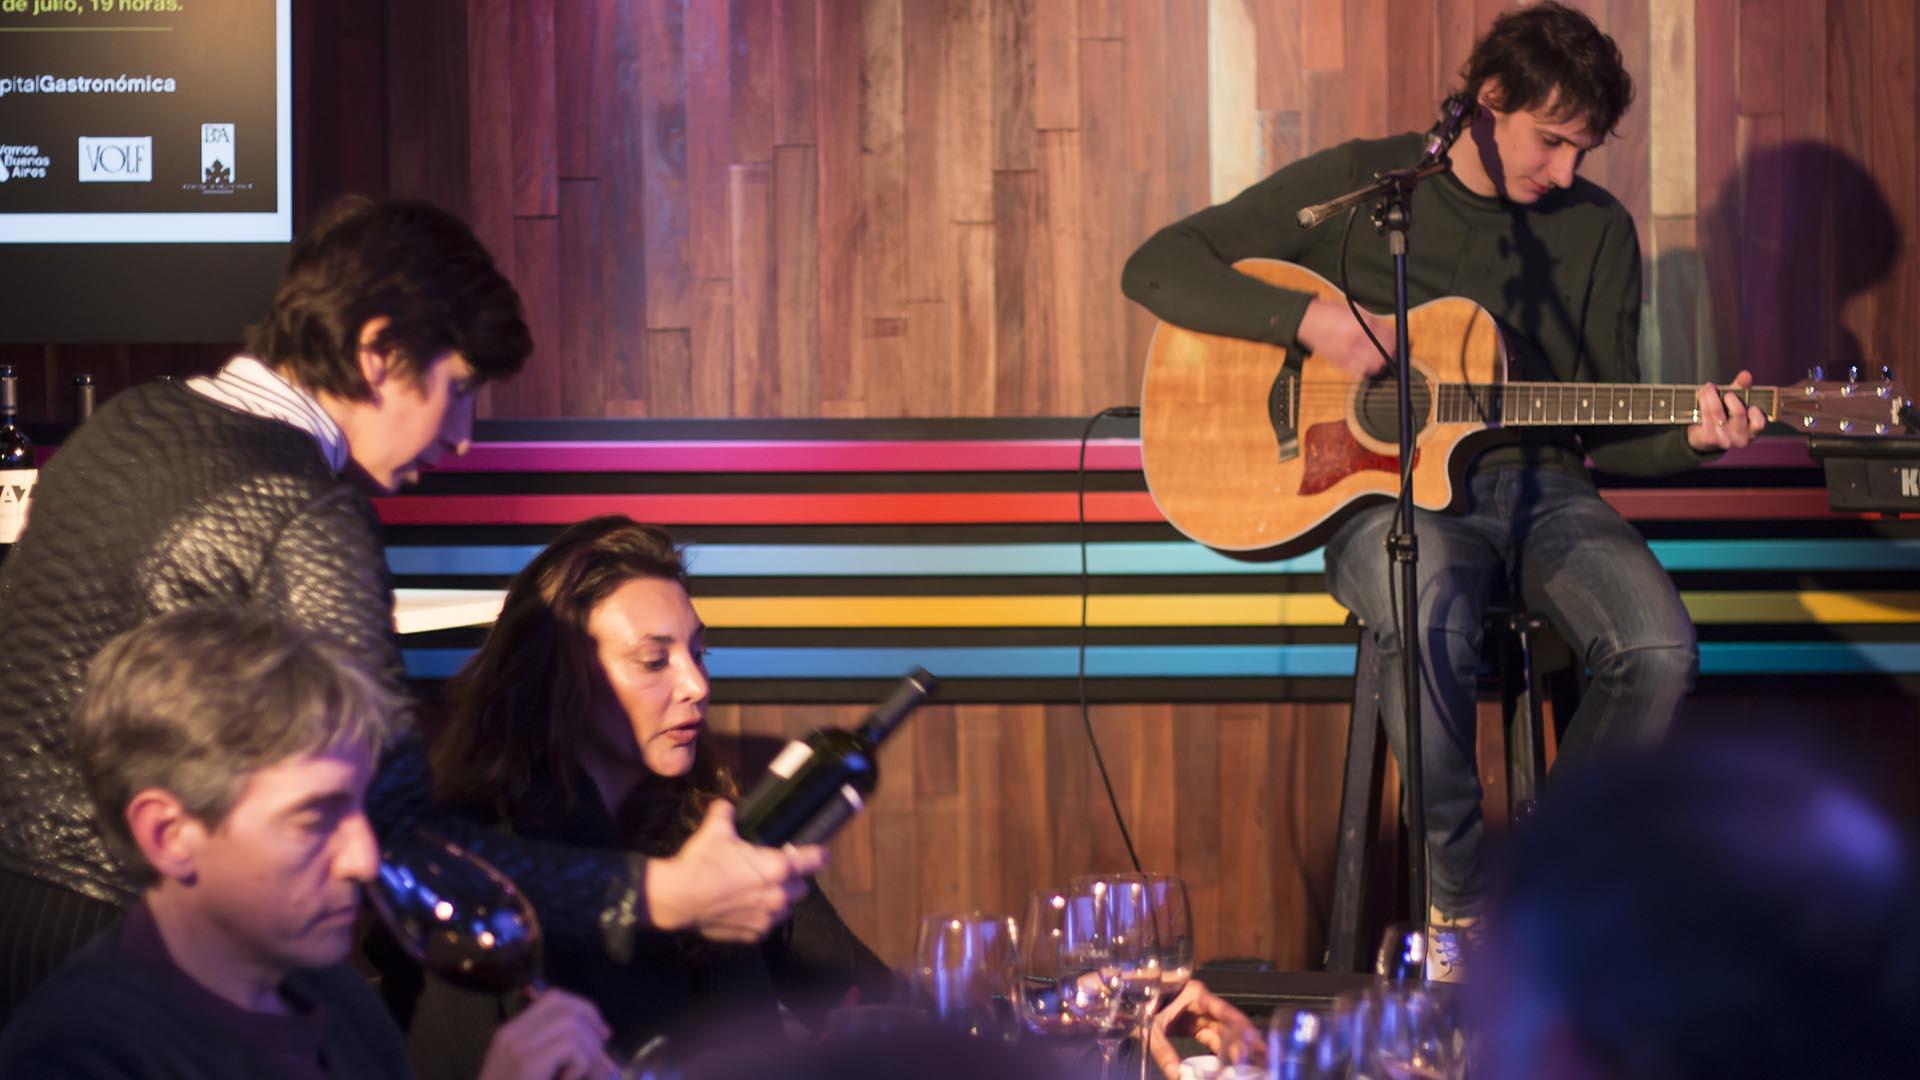 Ana Paula Vitelli durante la cata de vinos en Margen del Mundo, con la música de Nacho Lafflitto